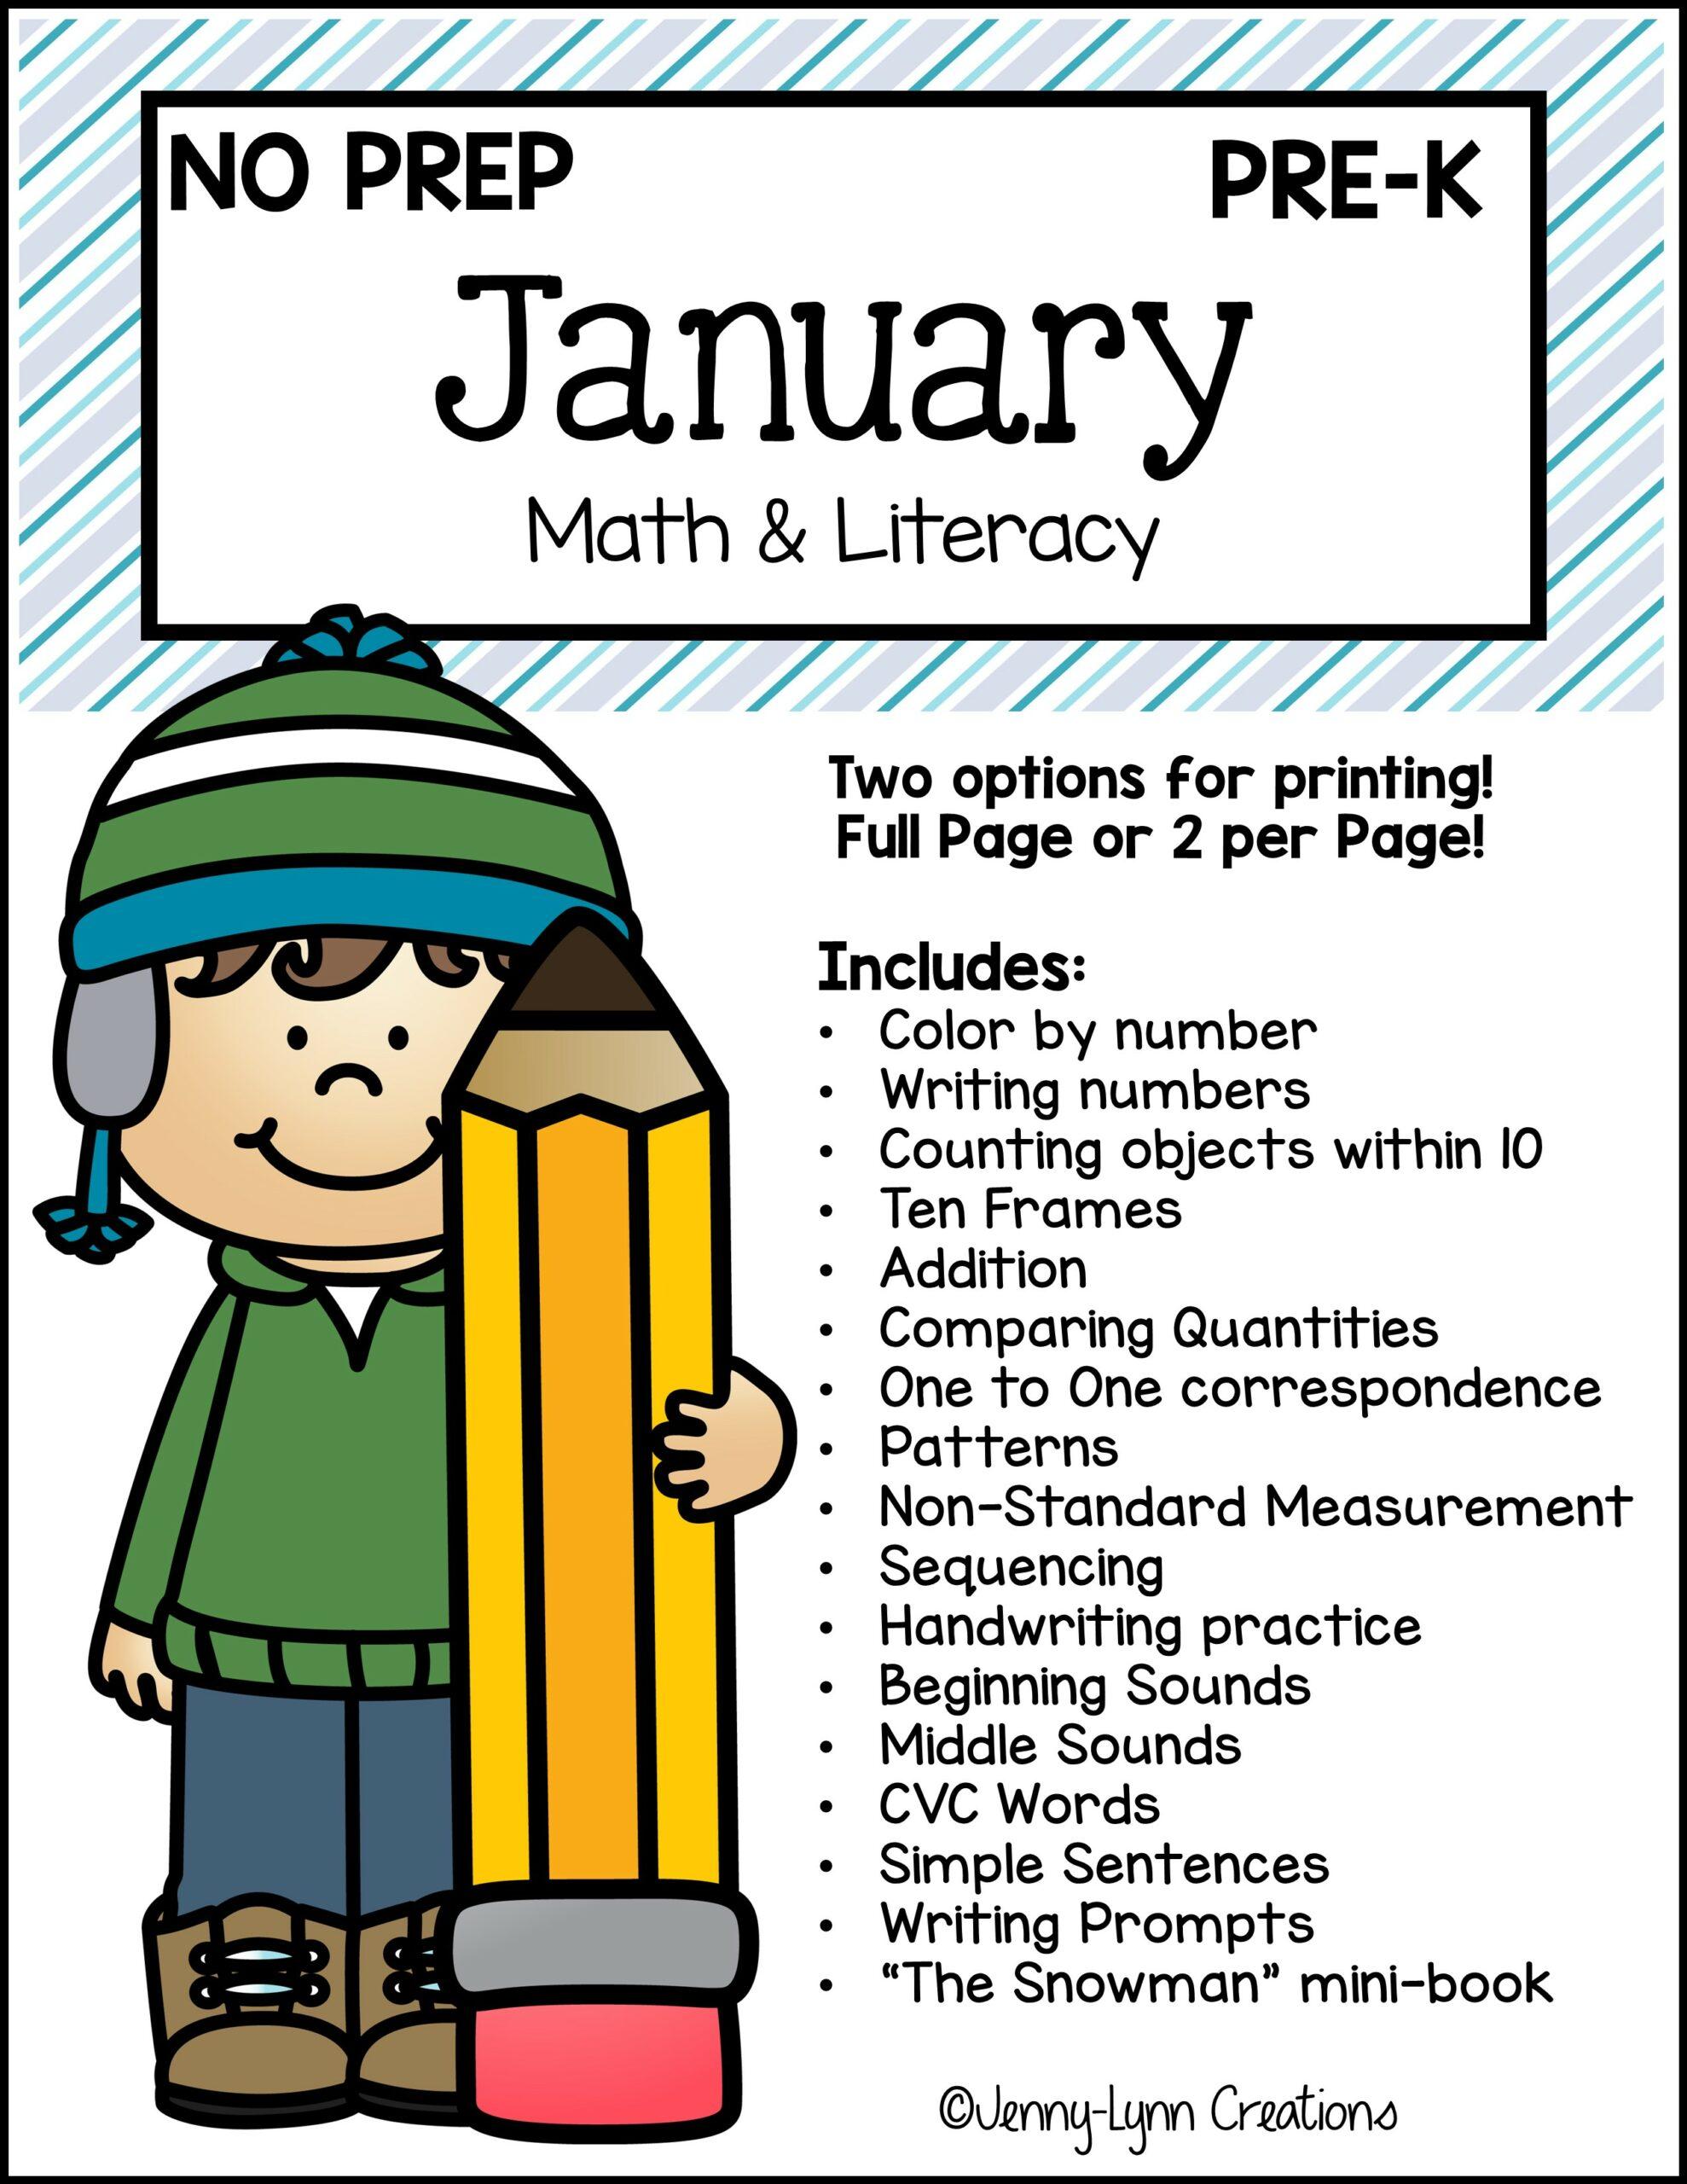 Preschool January Math and Literacy Printable Workbook